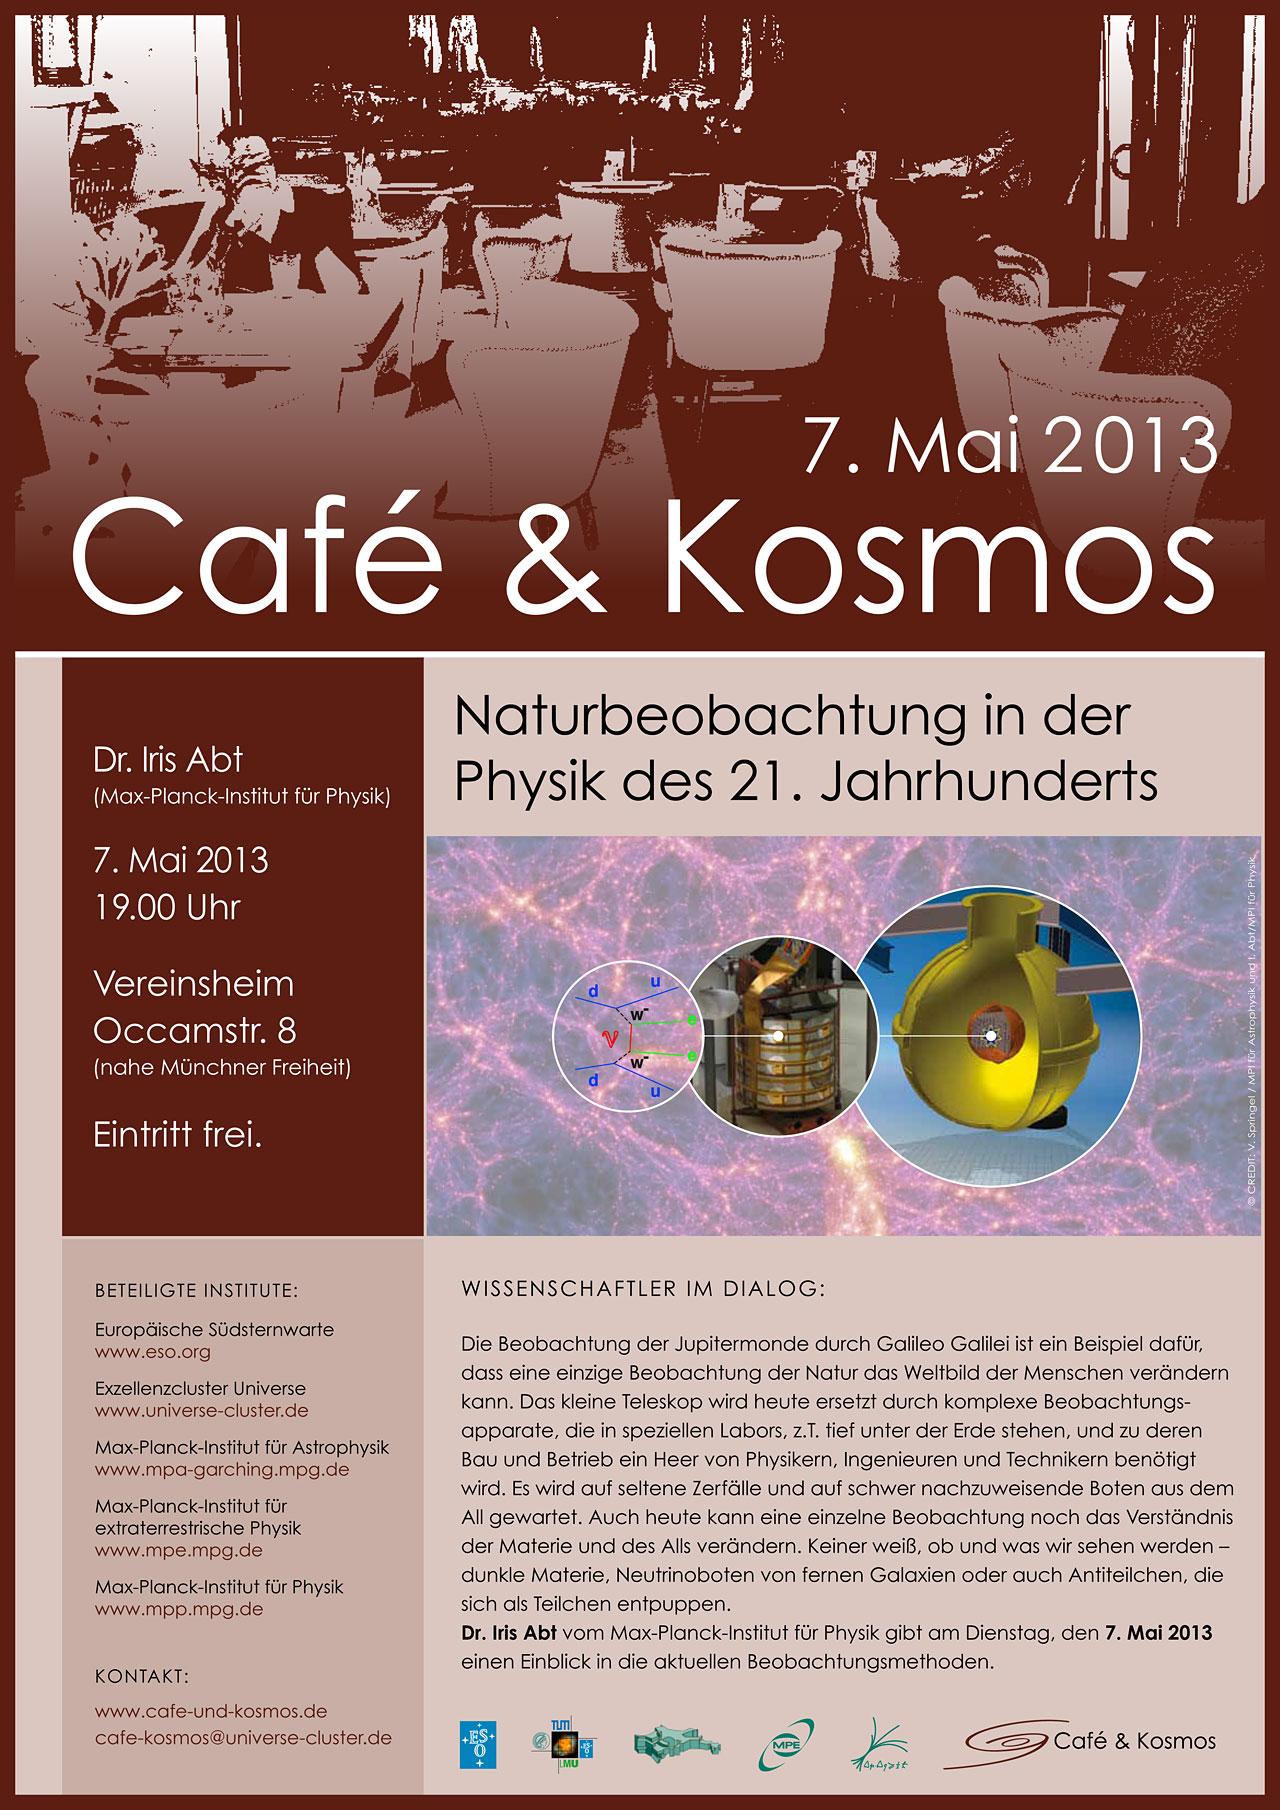 Café & Kosmos 7 May 2013